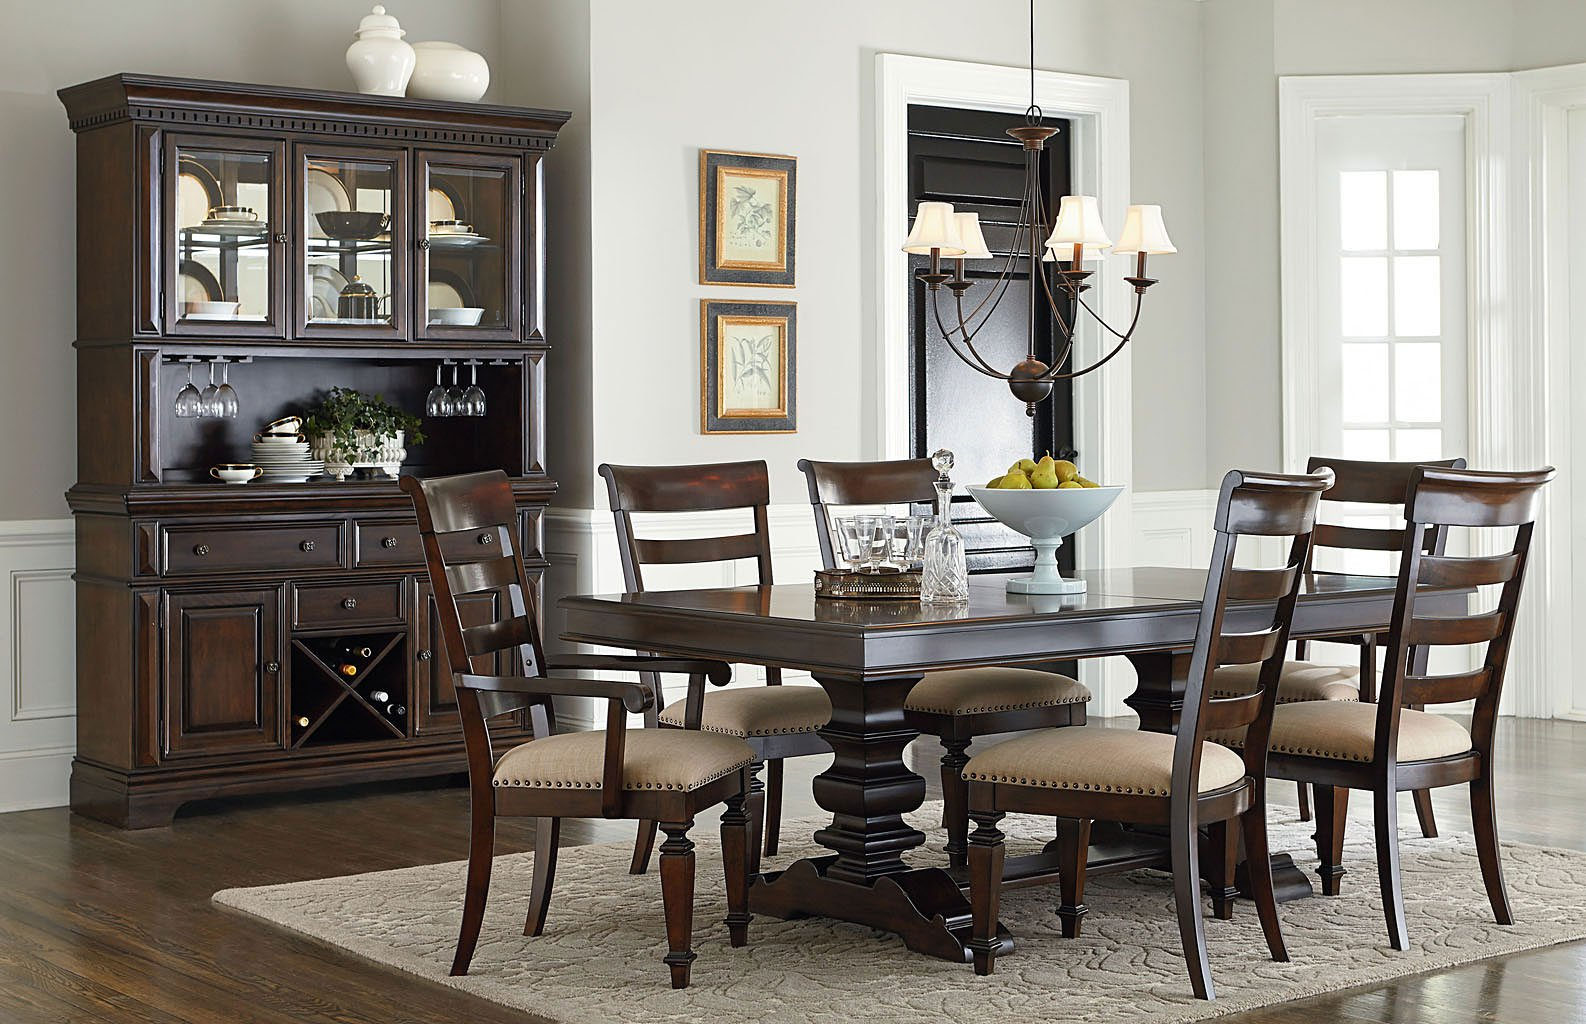 Merveilleux Charleston Dining Room Set